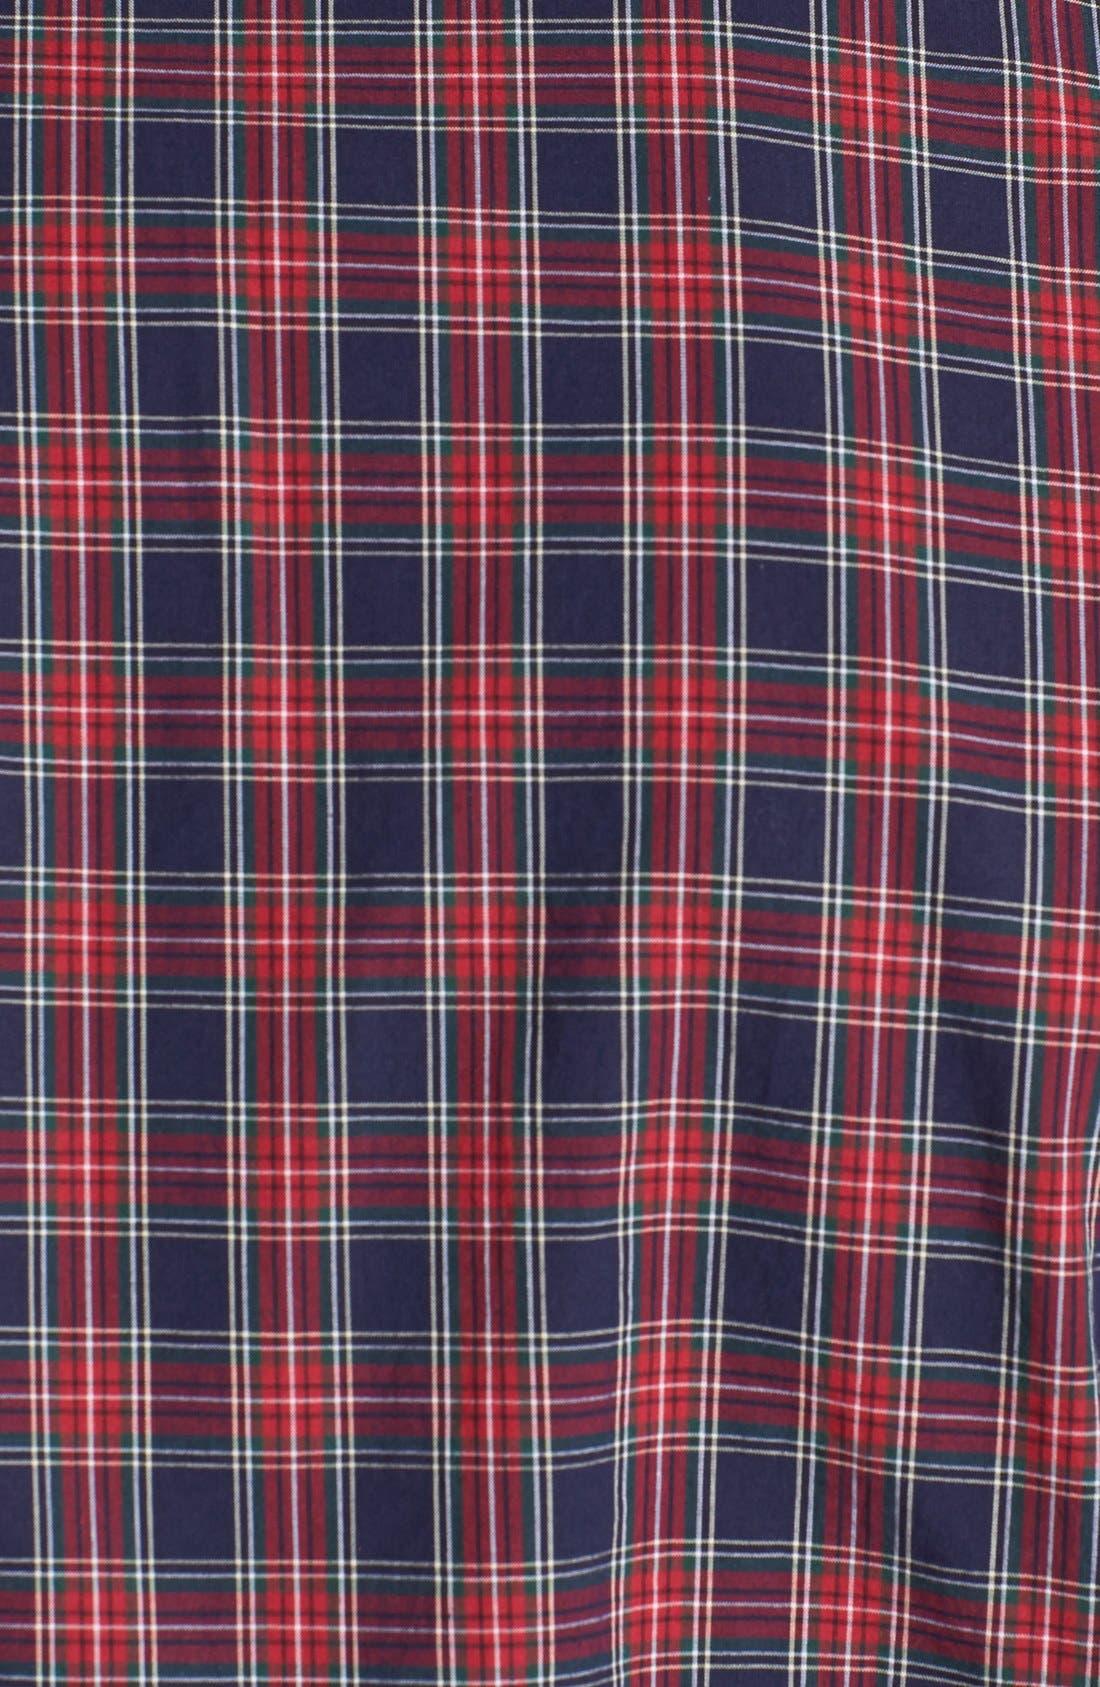 Alternate Image 3  - Billy Reid 'John T' Plaid Woven Shirt